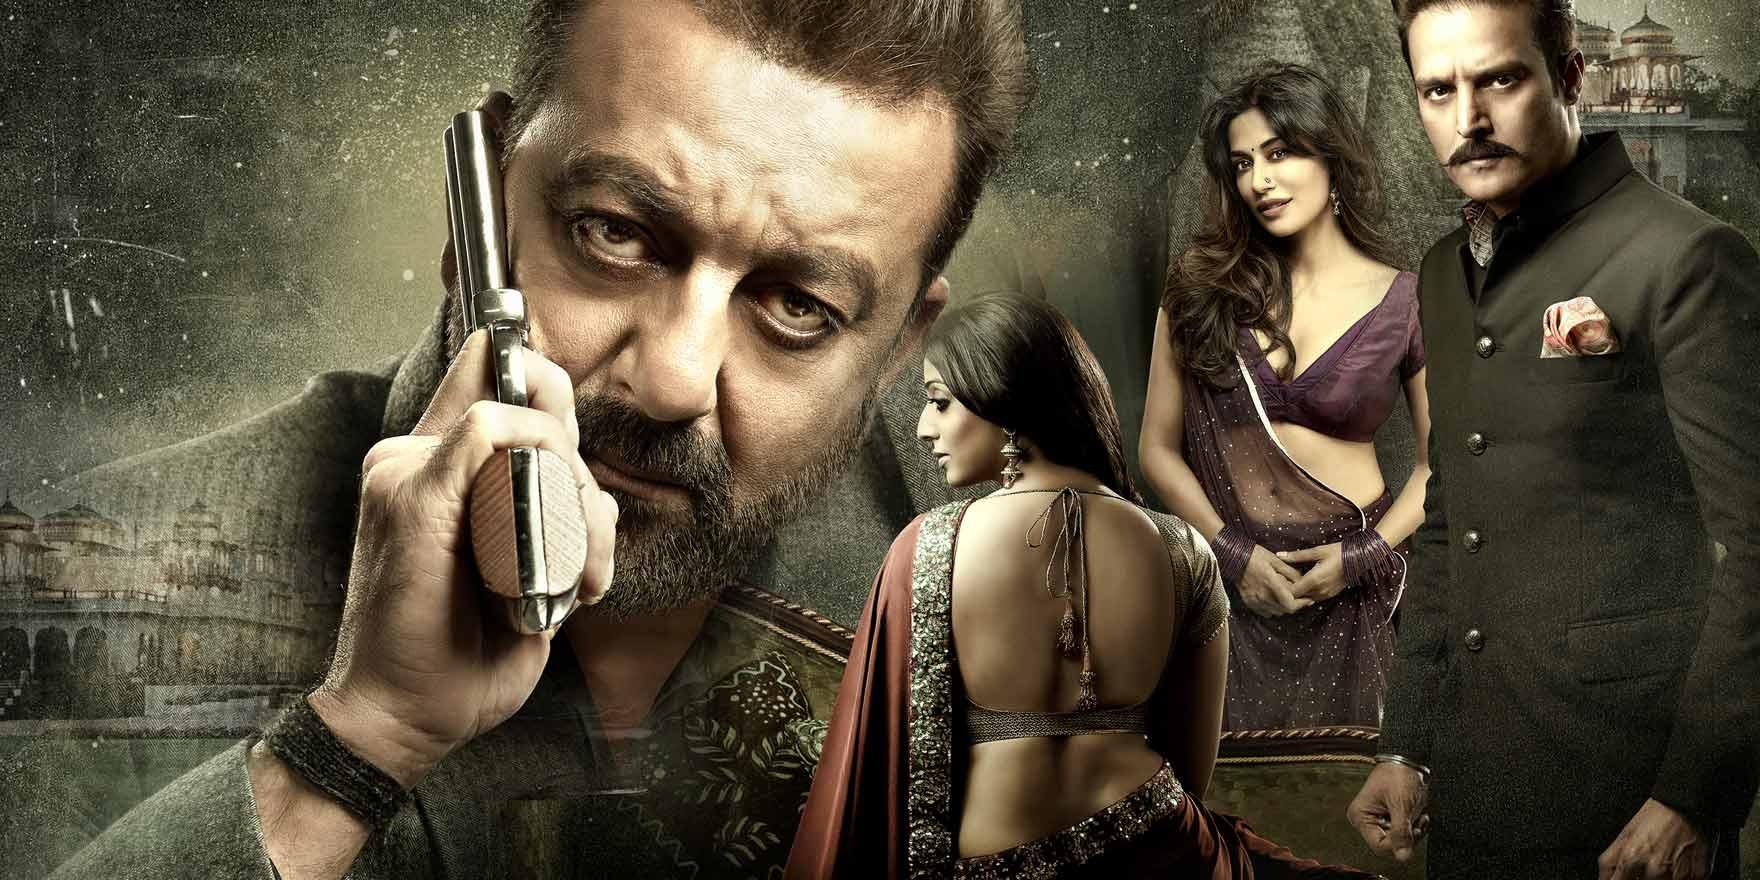 Saheb Biwi Aur Gangster 3 - Header Image